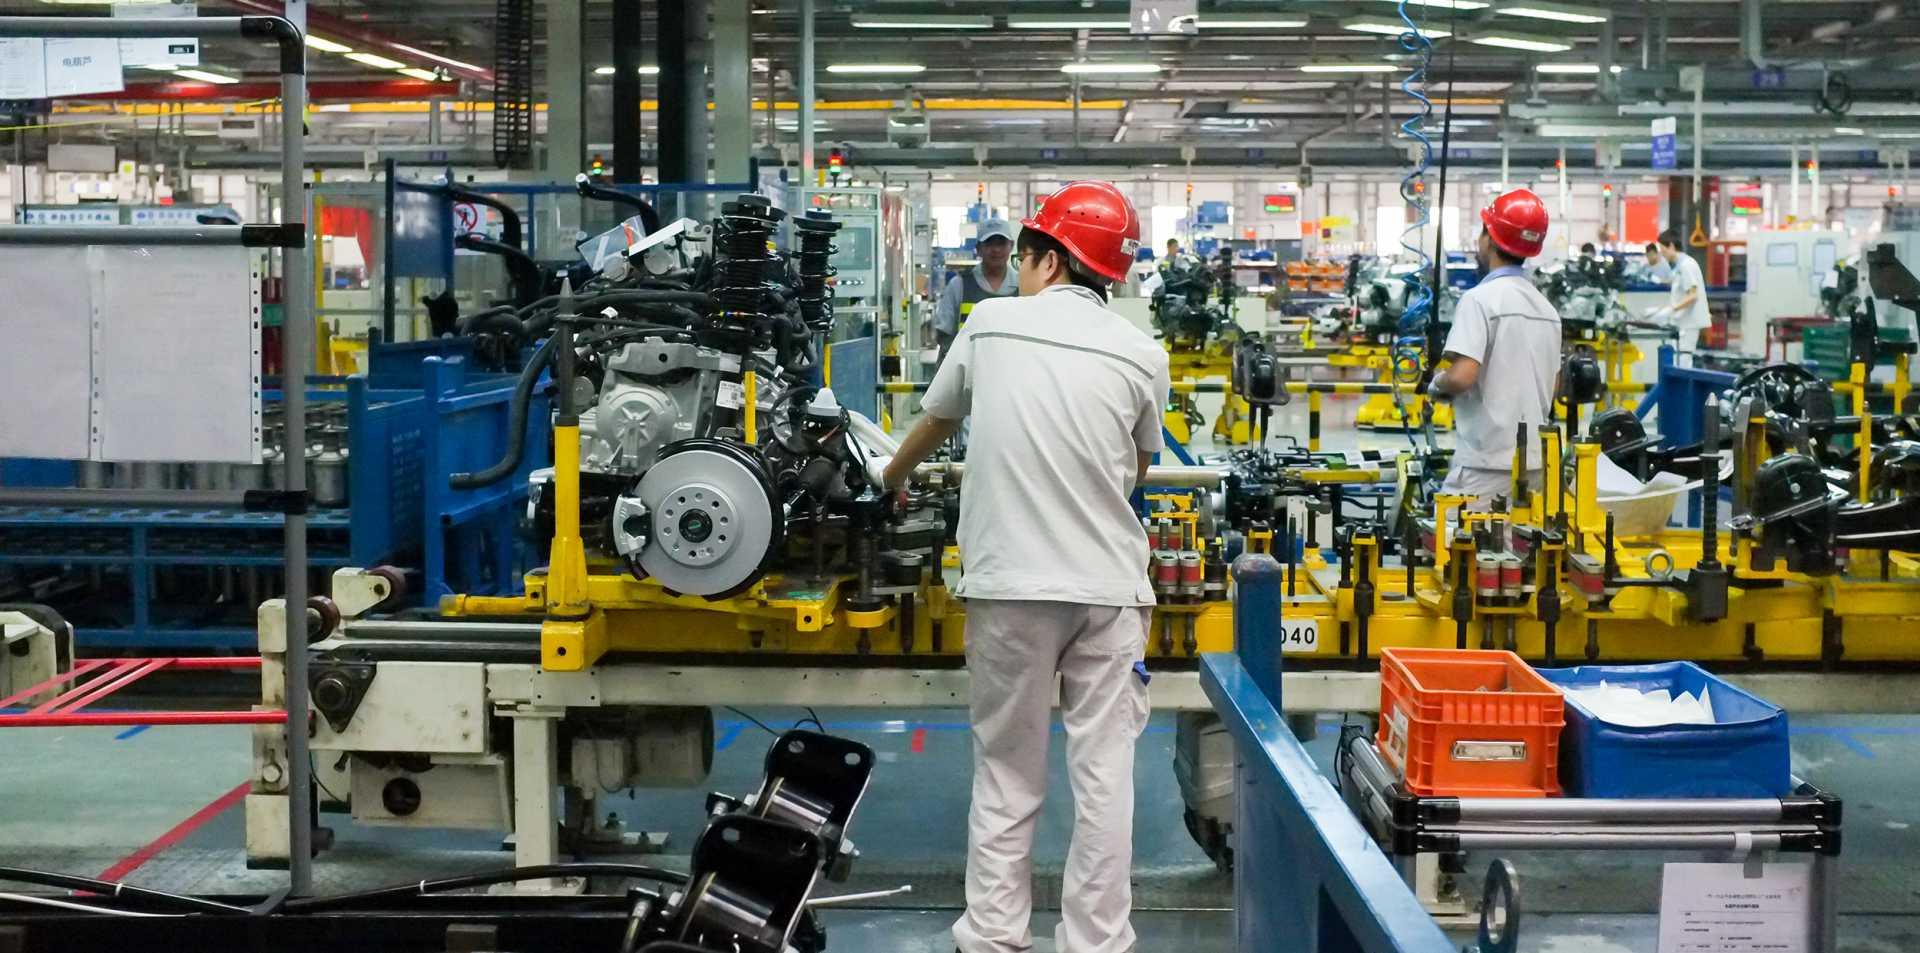 china auto plant (Shutterstock)